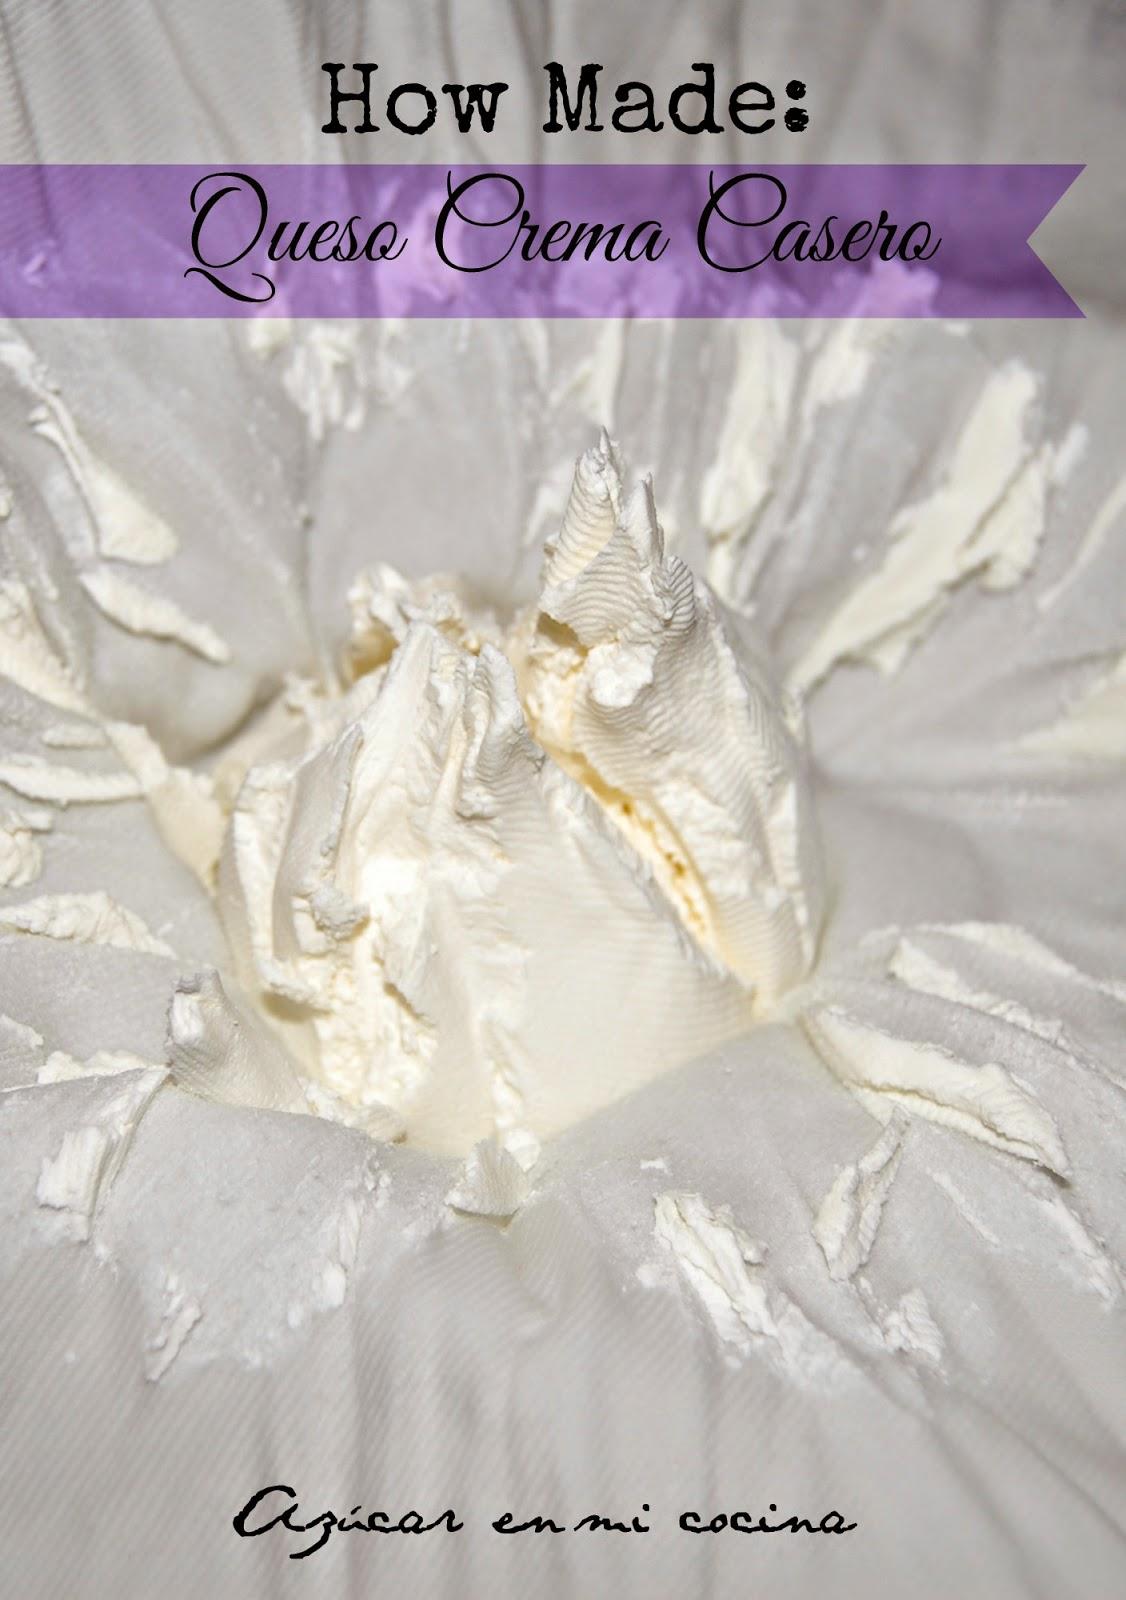 http://azucarenmicocina.blogspot.com.es/2015/03/how-made-queso-crema-casero-el.html